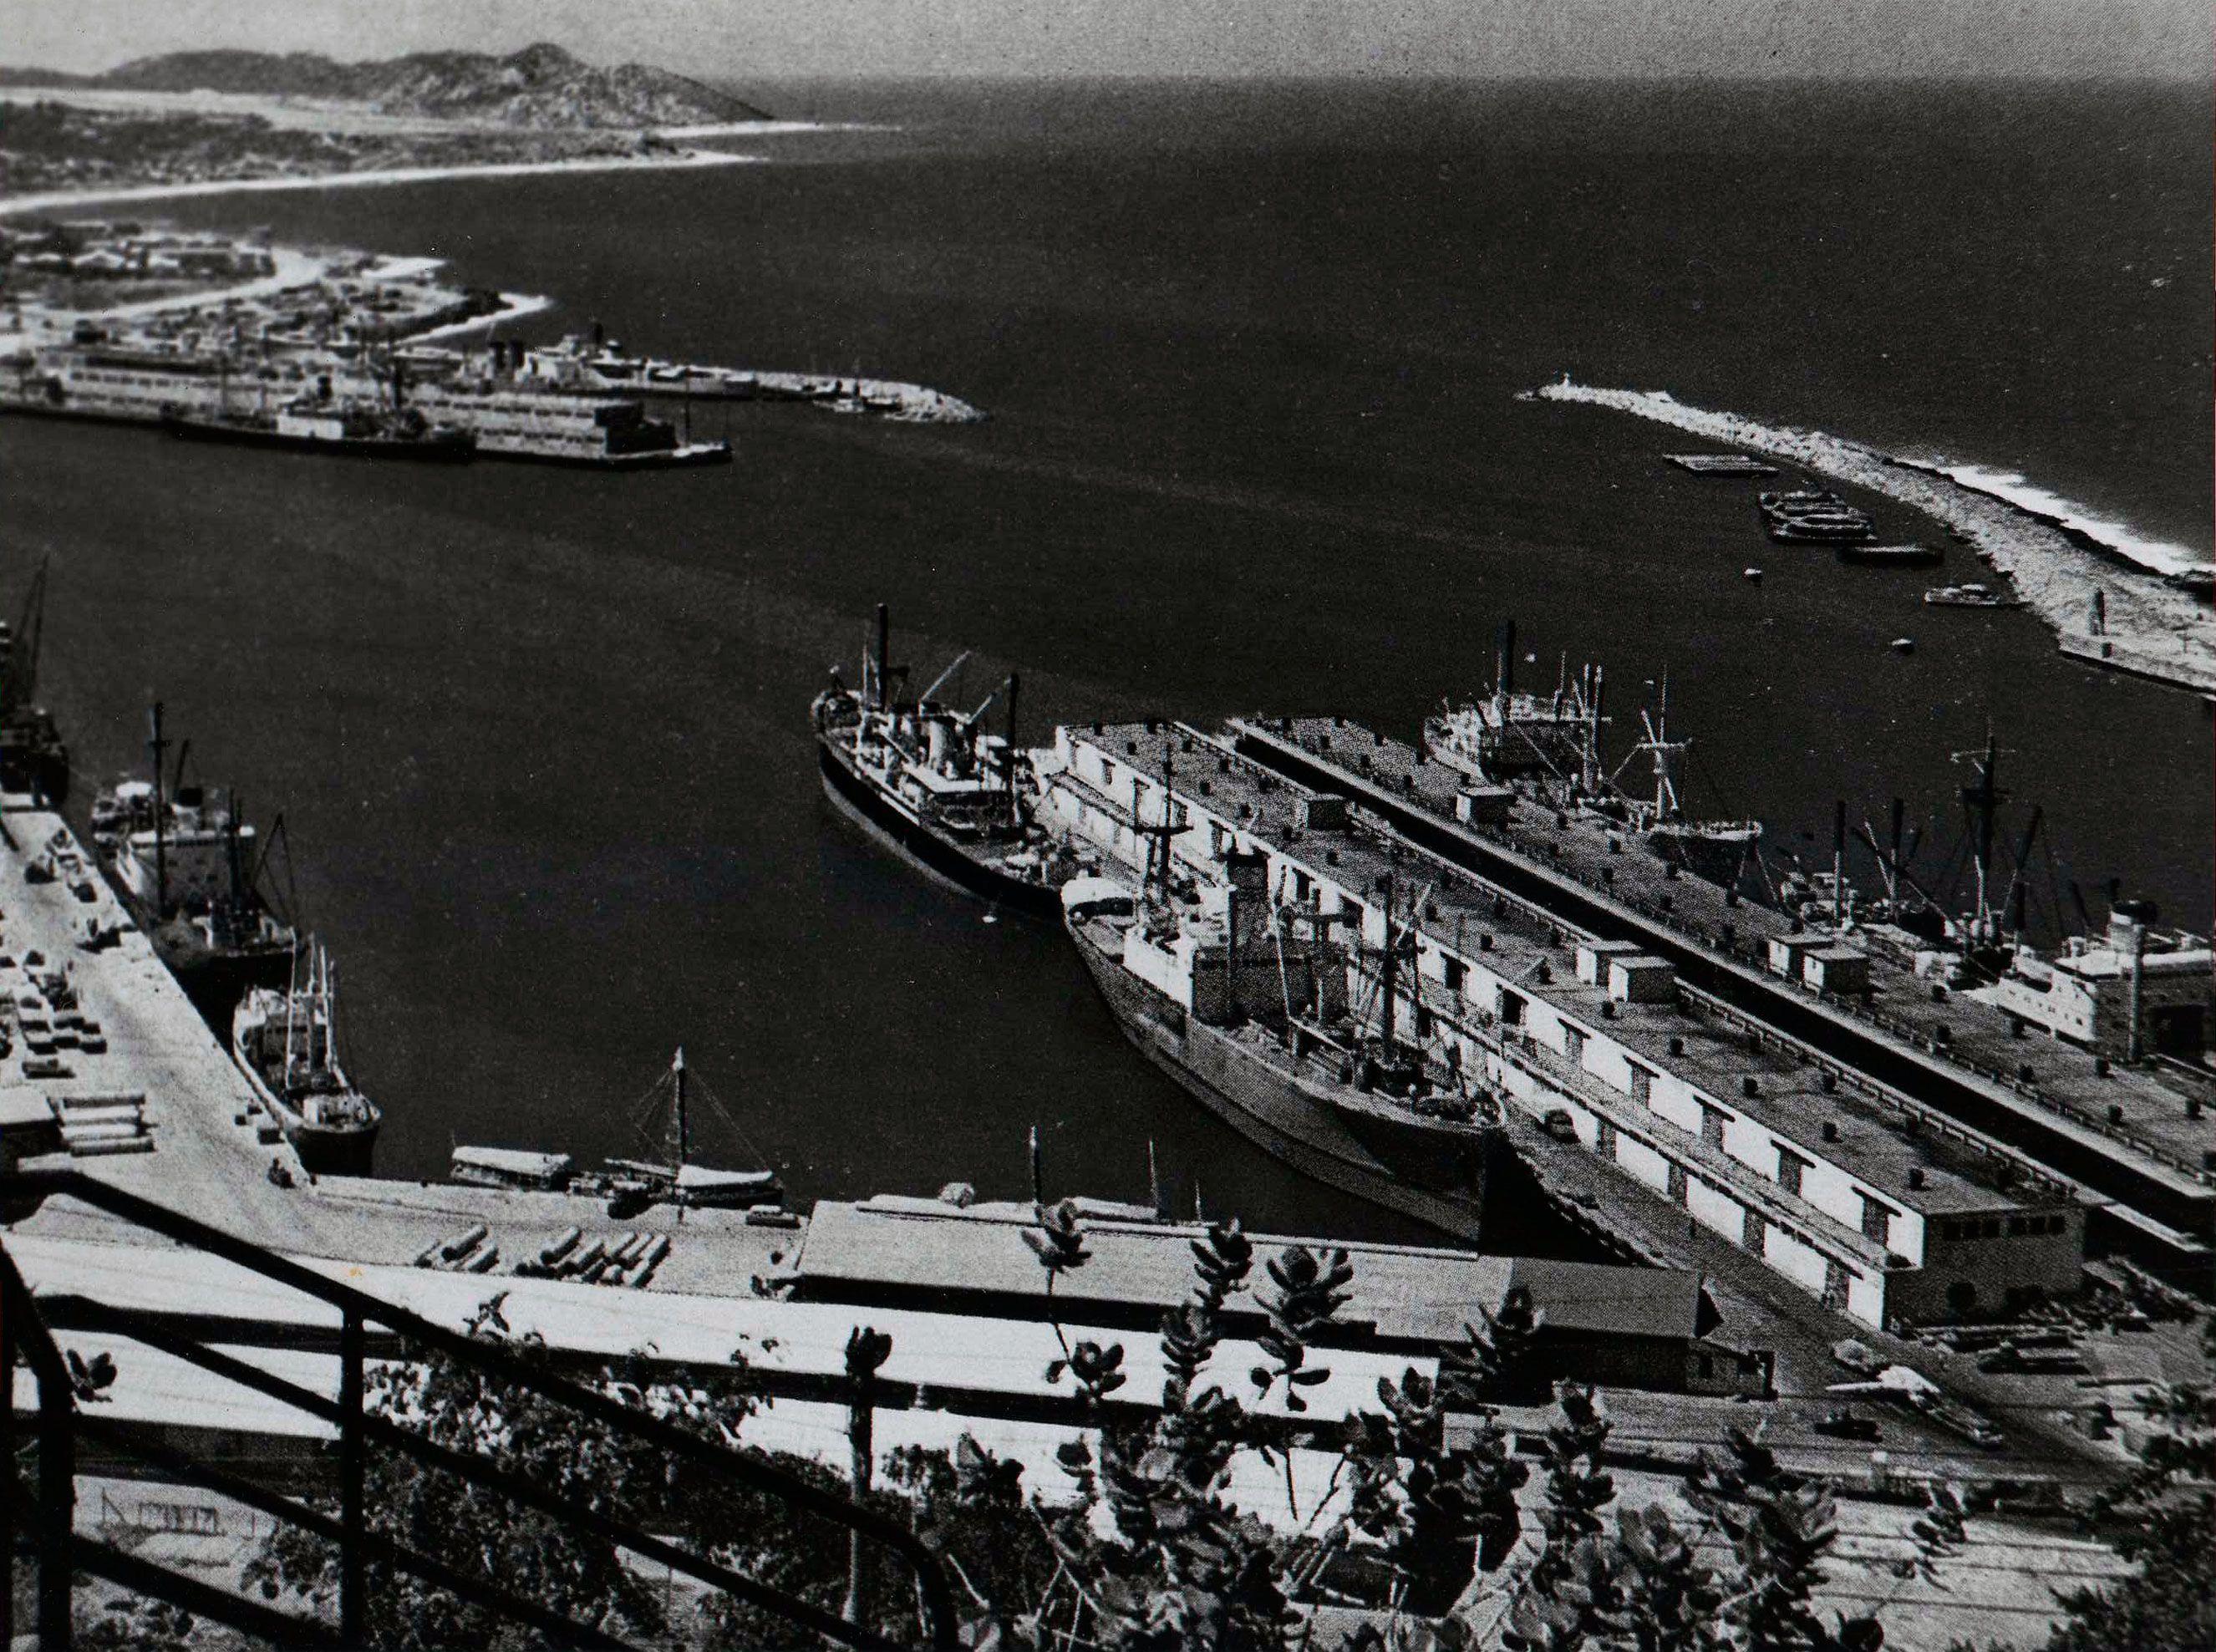 Panoramica Desde Lo Alto Del Fortin De La Guaira De Nuestro Antiguo Puerto Varguense Circa 1944 1953 Imagen Cortesia D Sydney Opera House Opera House Travel